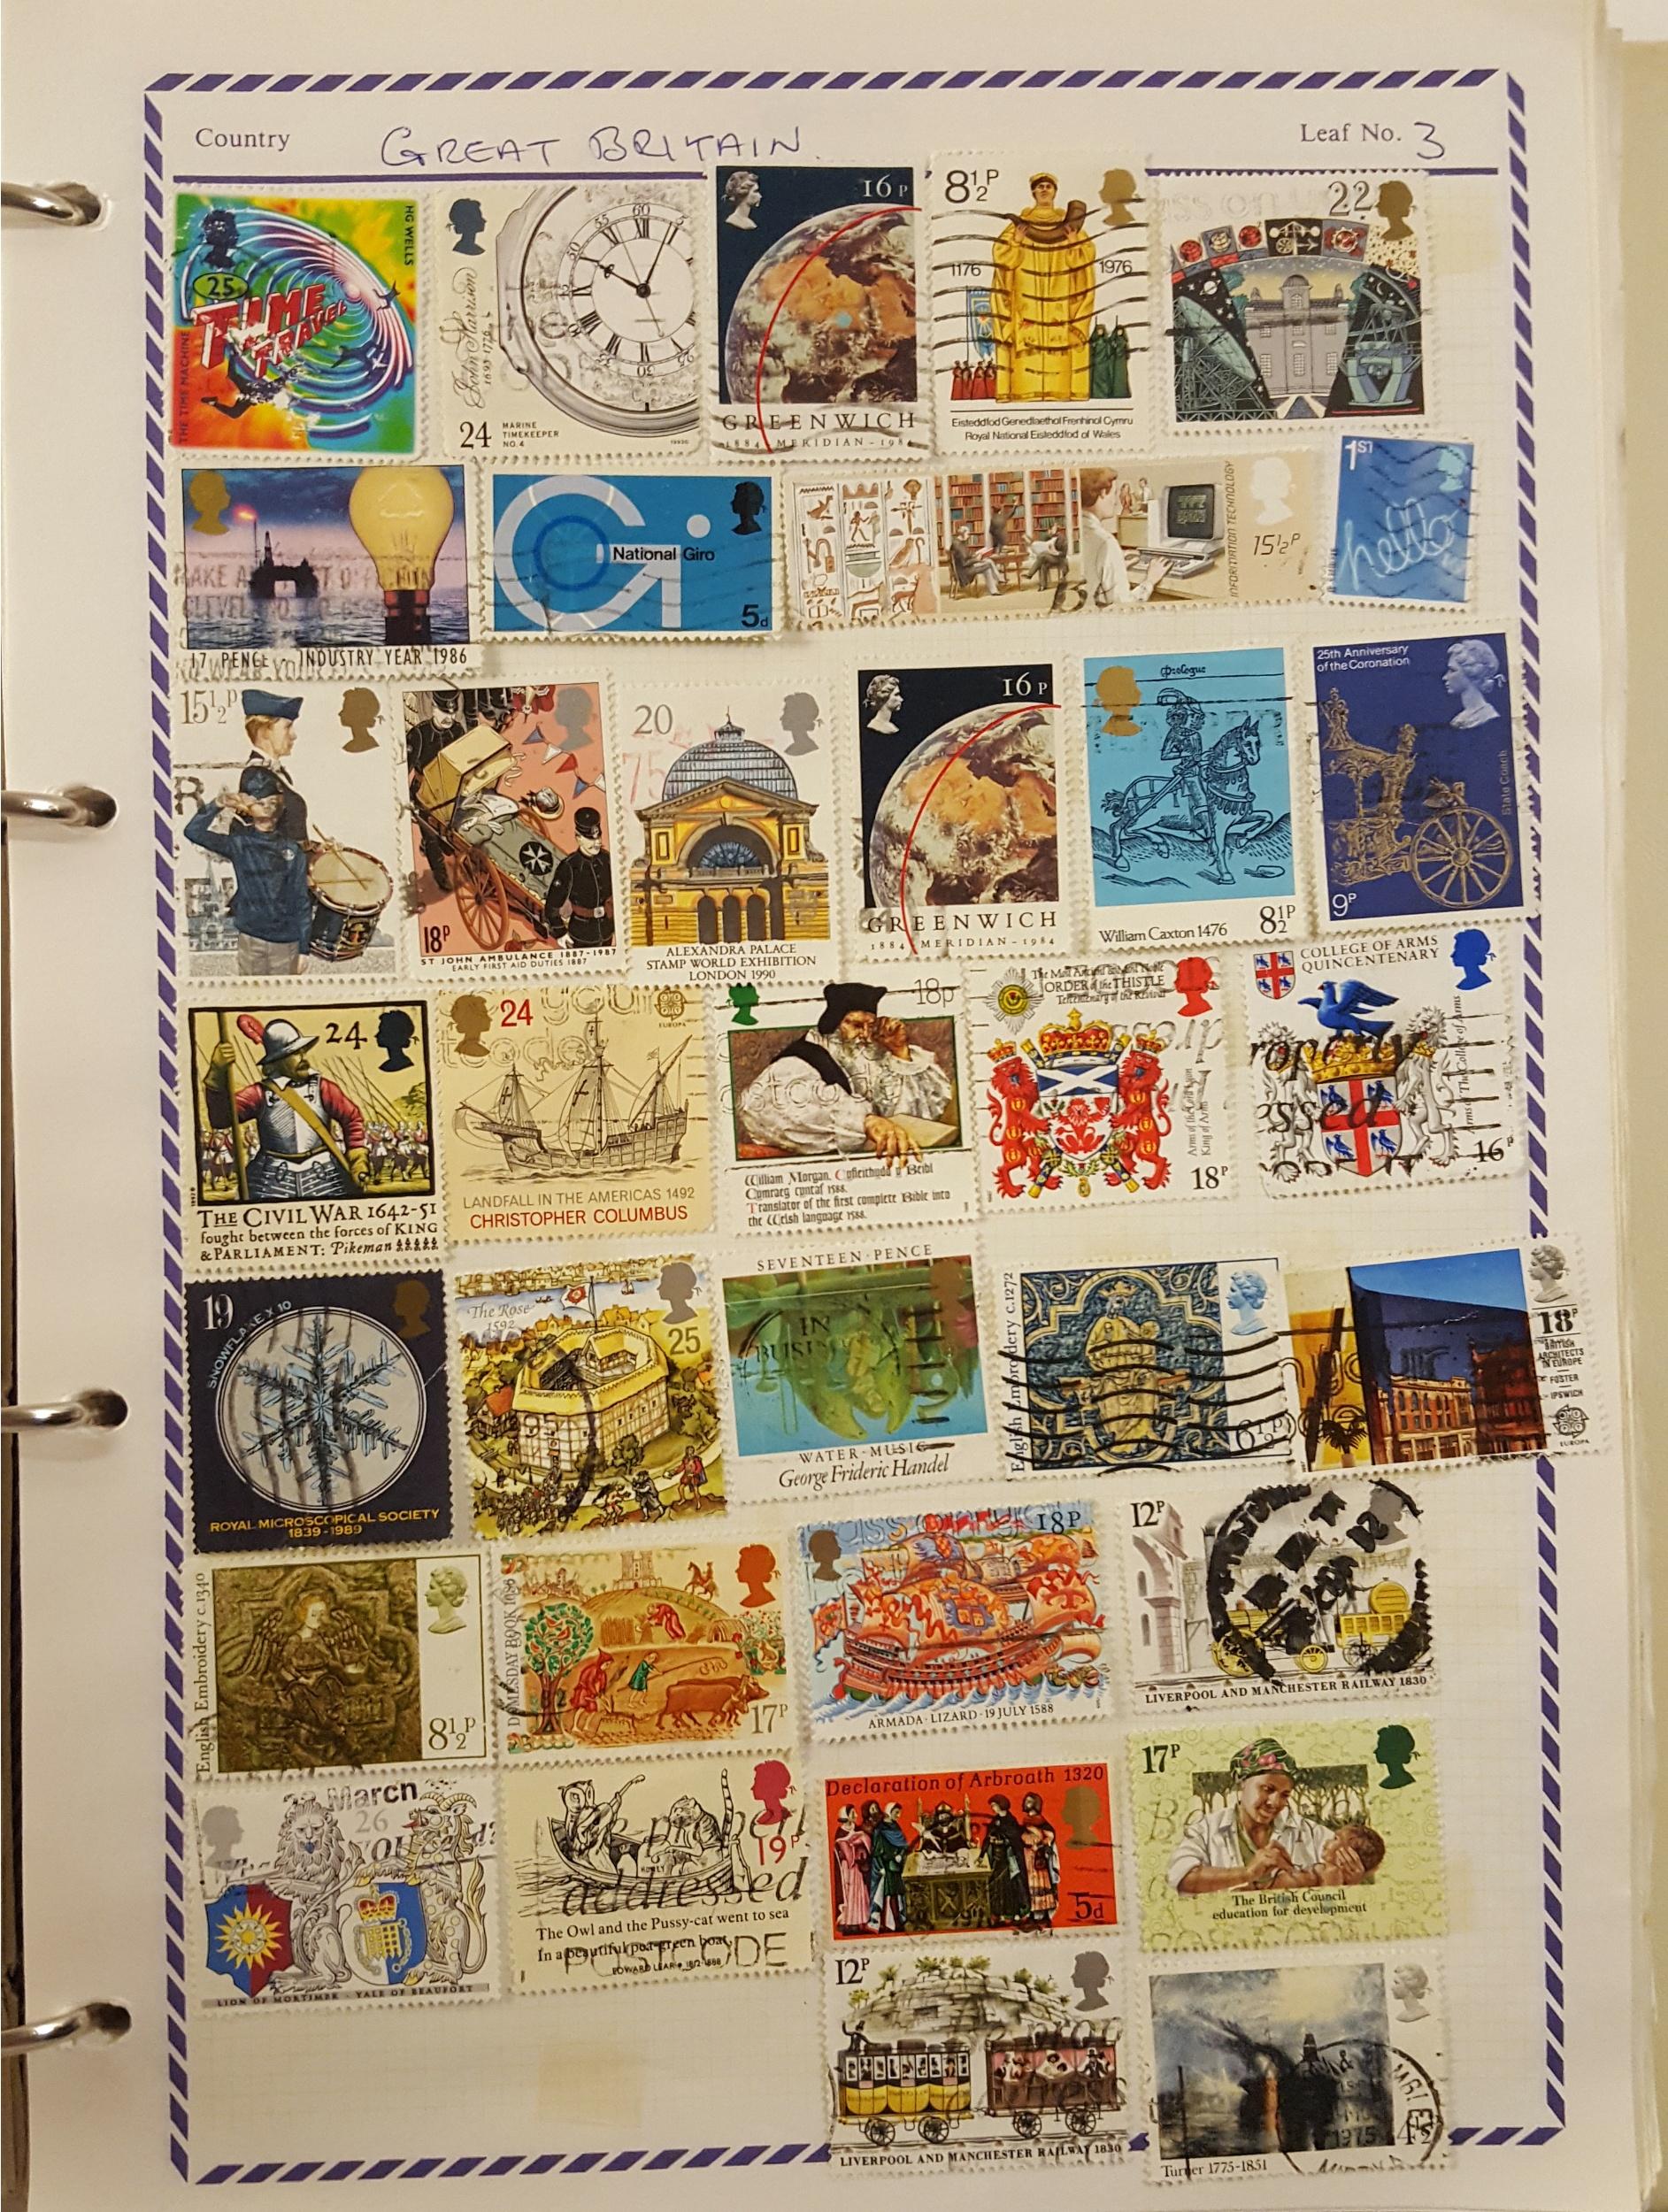 Lot 56 - Philatelia Stamp Album Loose Leaf 600 Plus Great Britain Commonwealth & World Stamps